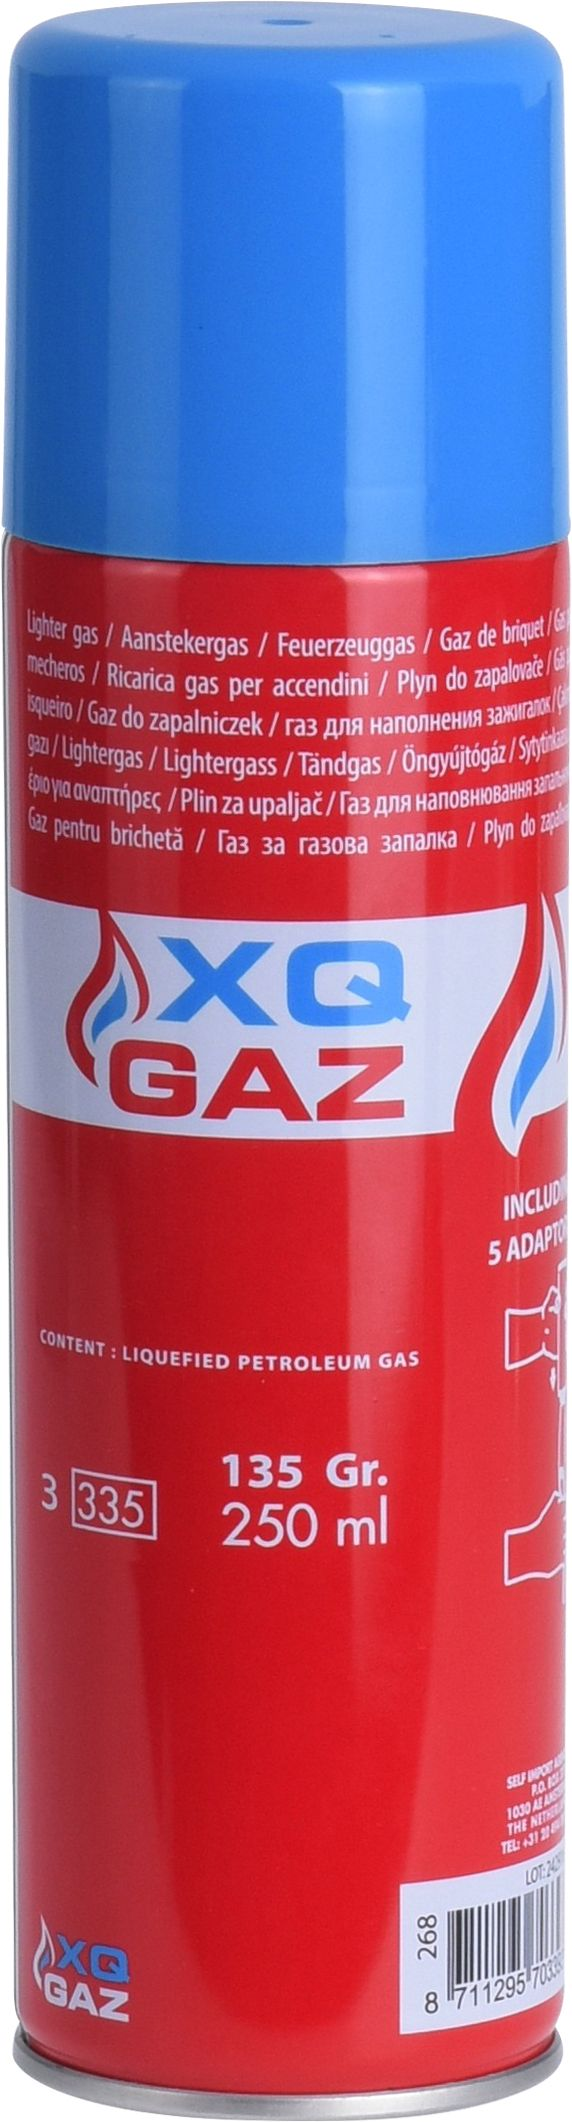 navulling_gas_250_ml_1